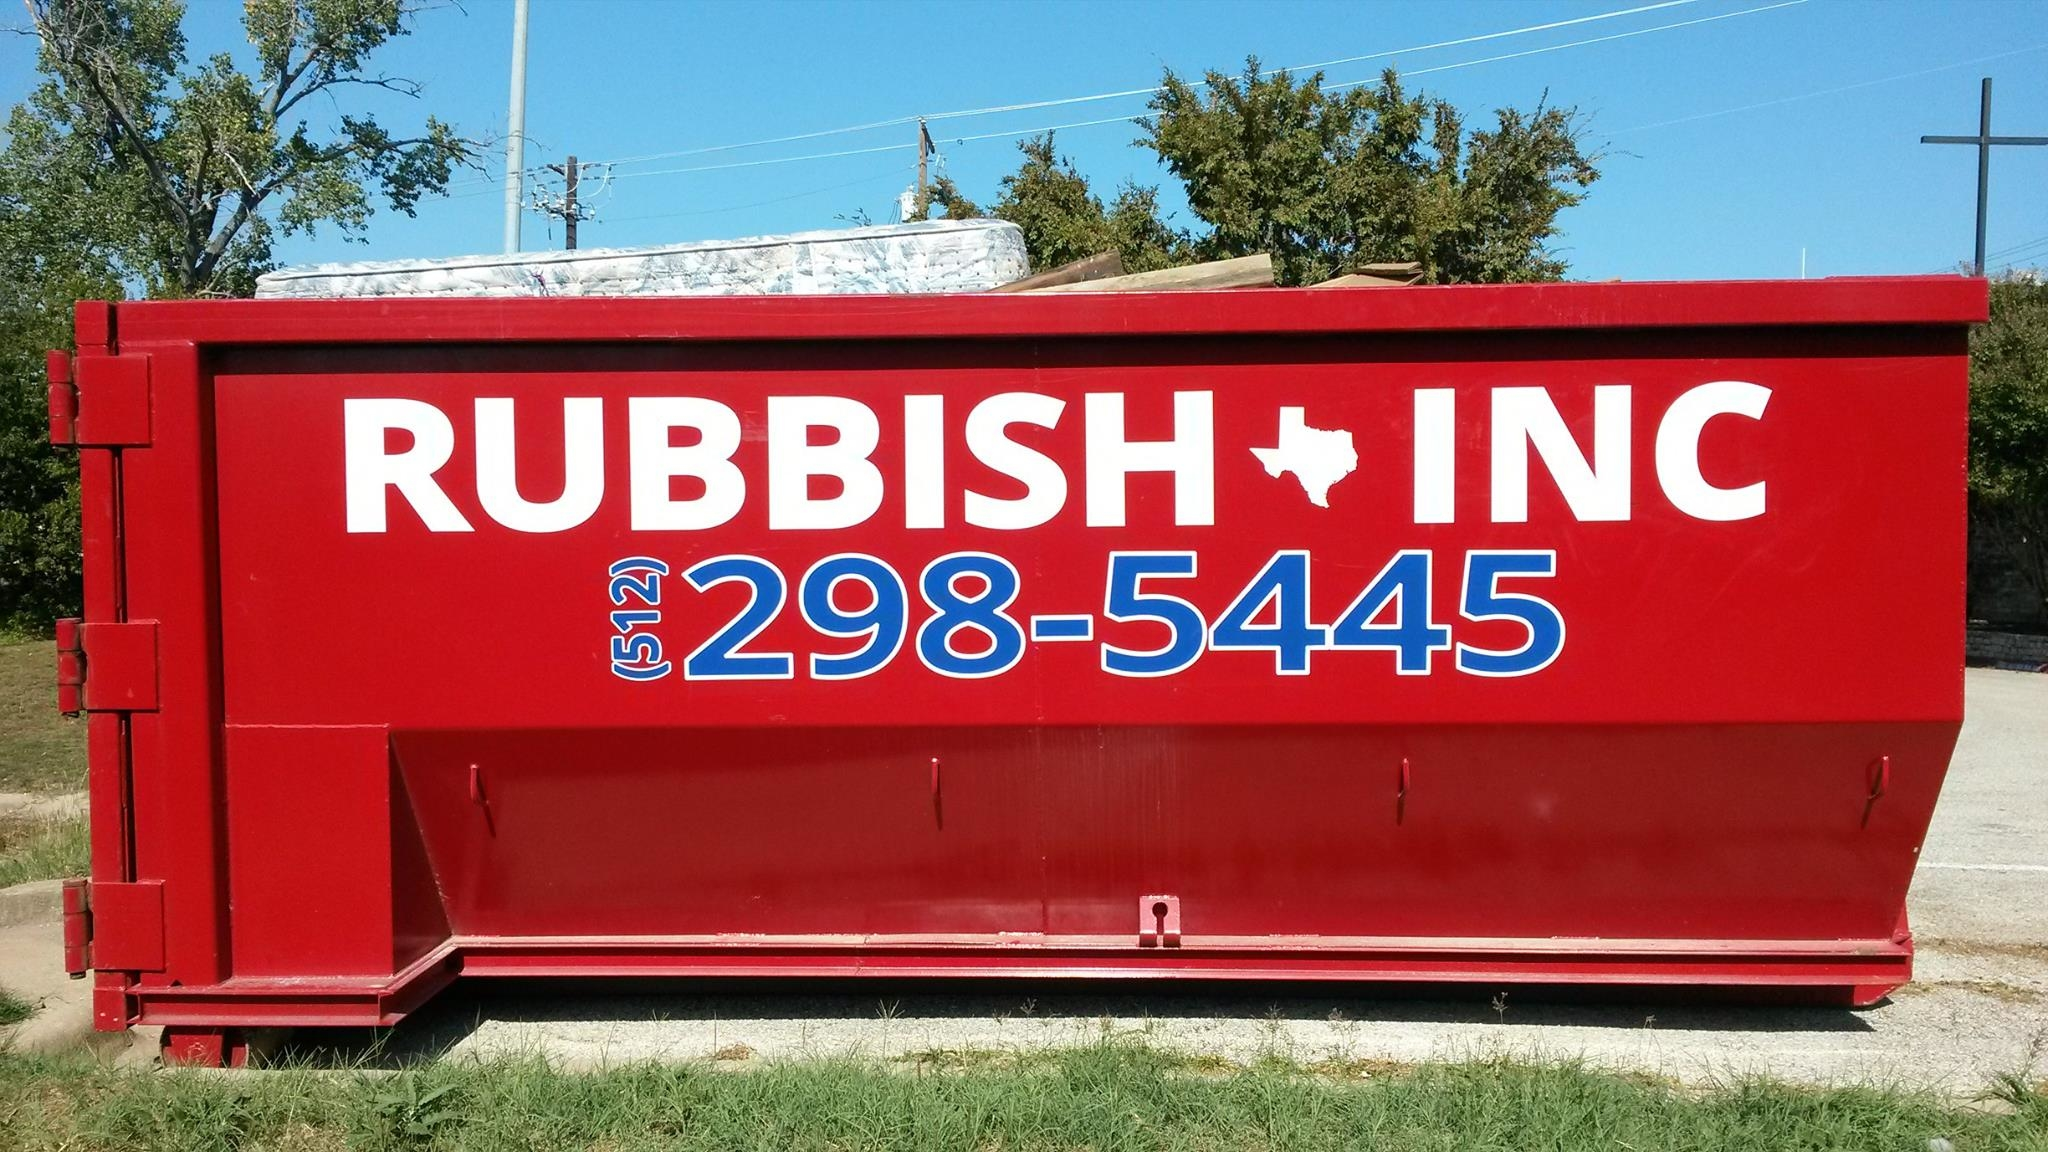 Rubbish Inc - West Austin image 2